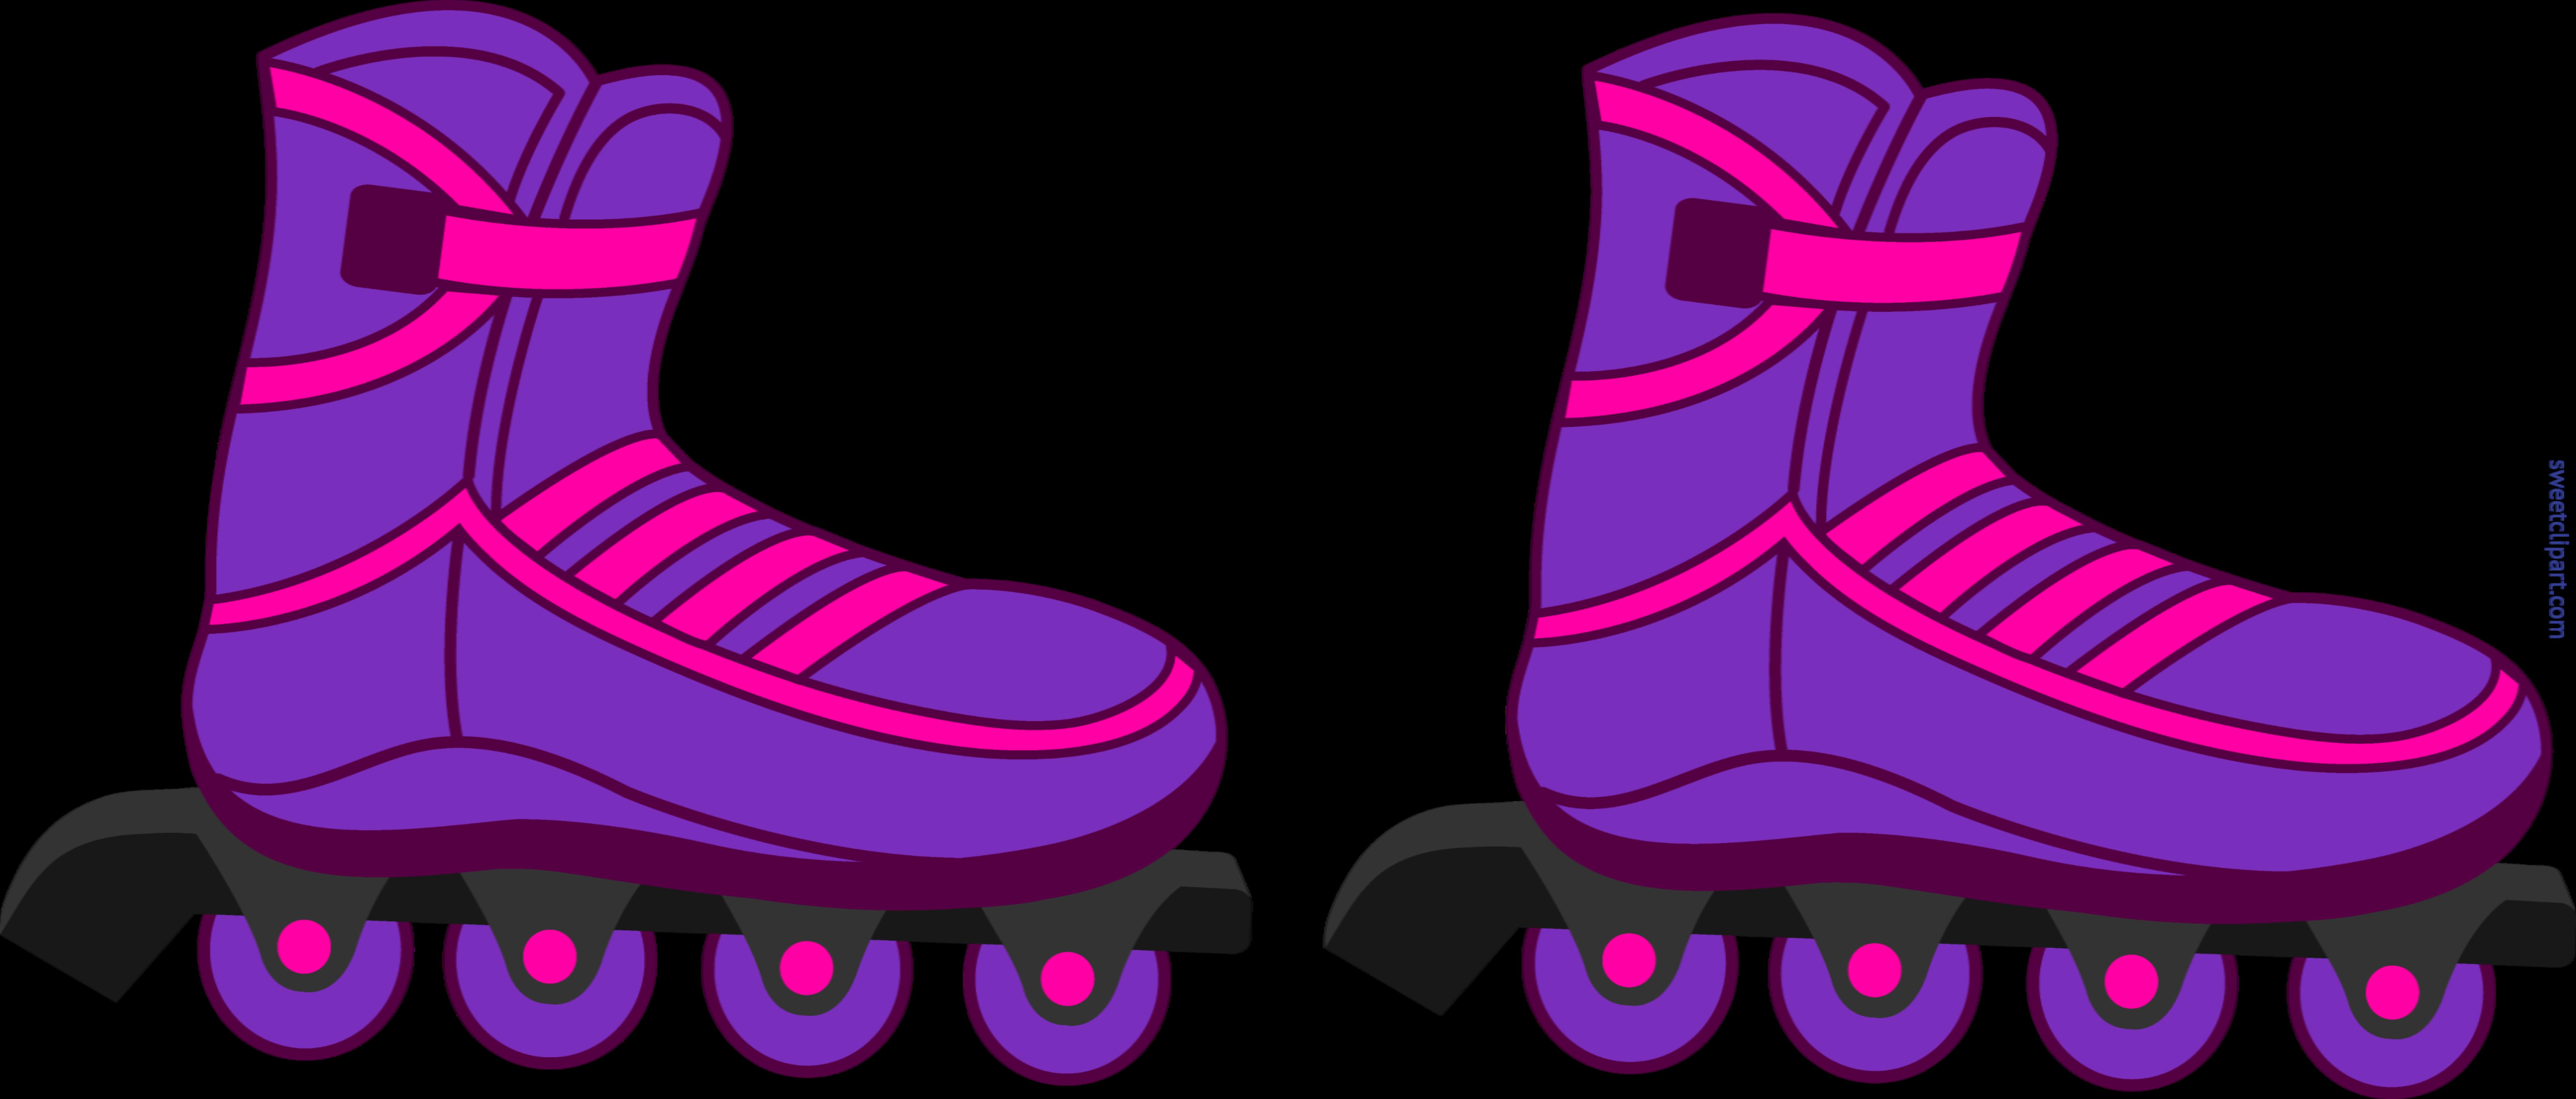 rollerblades purple clip art sweet clip art rh m sweetclipart com roller skate clip art websites roller skates clipart images